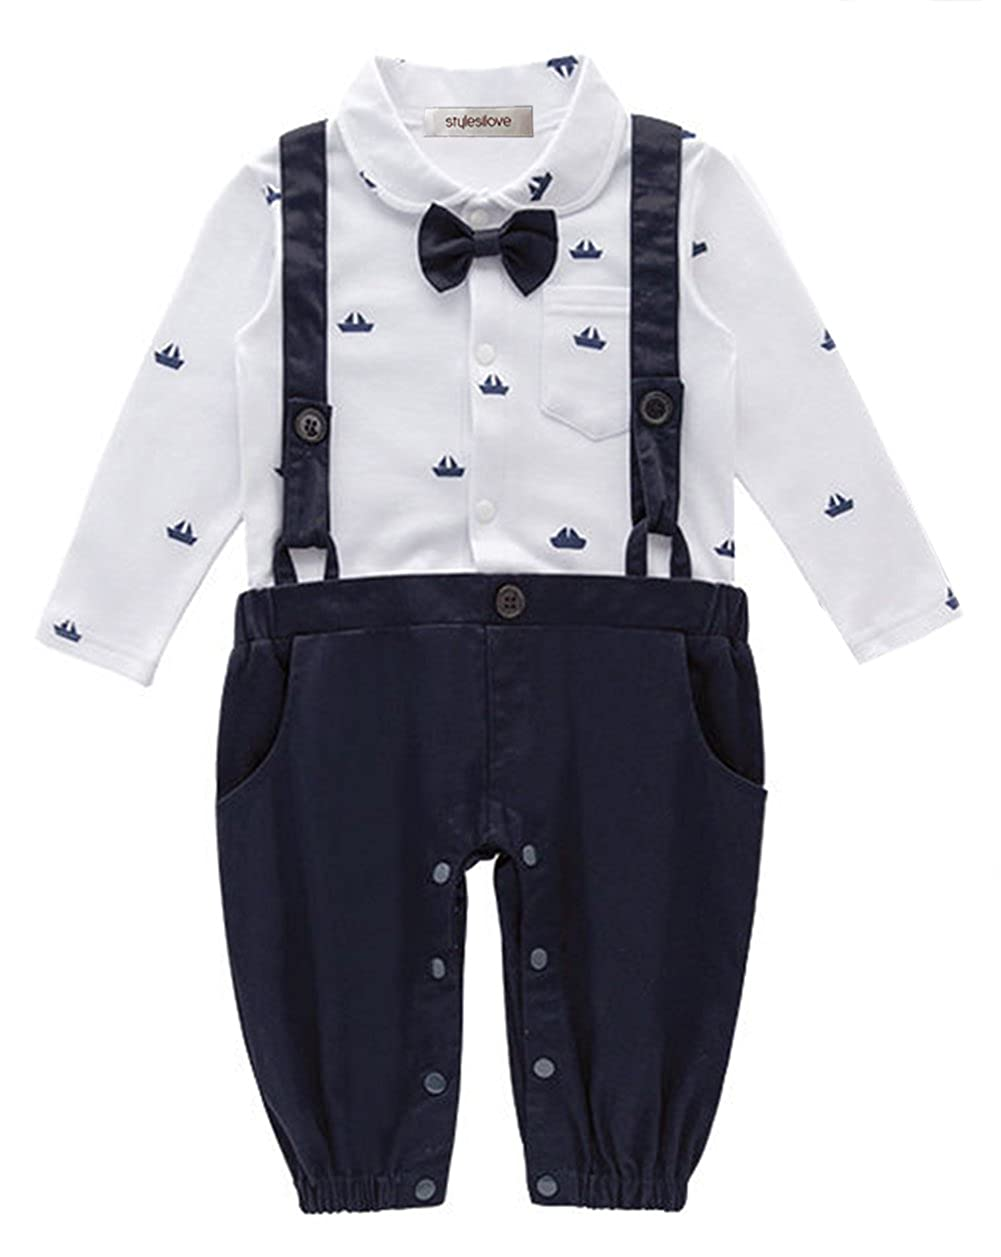 fc8f7d1e6 stylesilove Sailor Boat Print Faux Suspender Formal Wear Baby Boy Romper  (80/6-12 Months, Navy Blue)